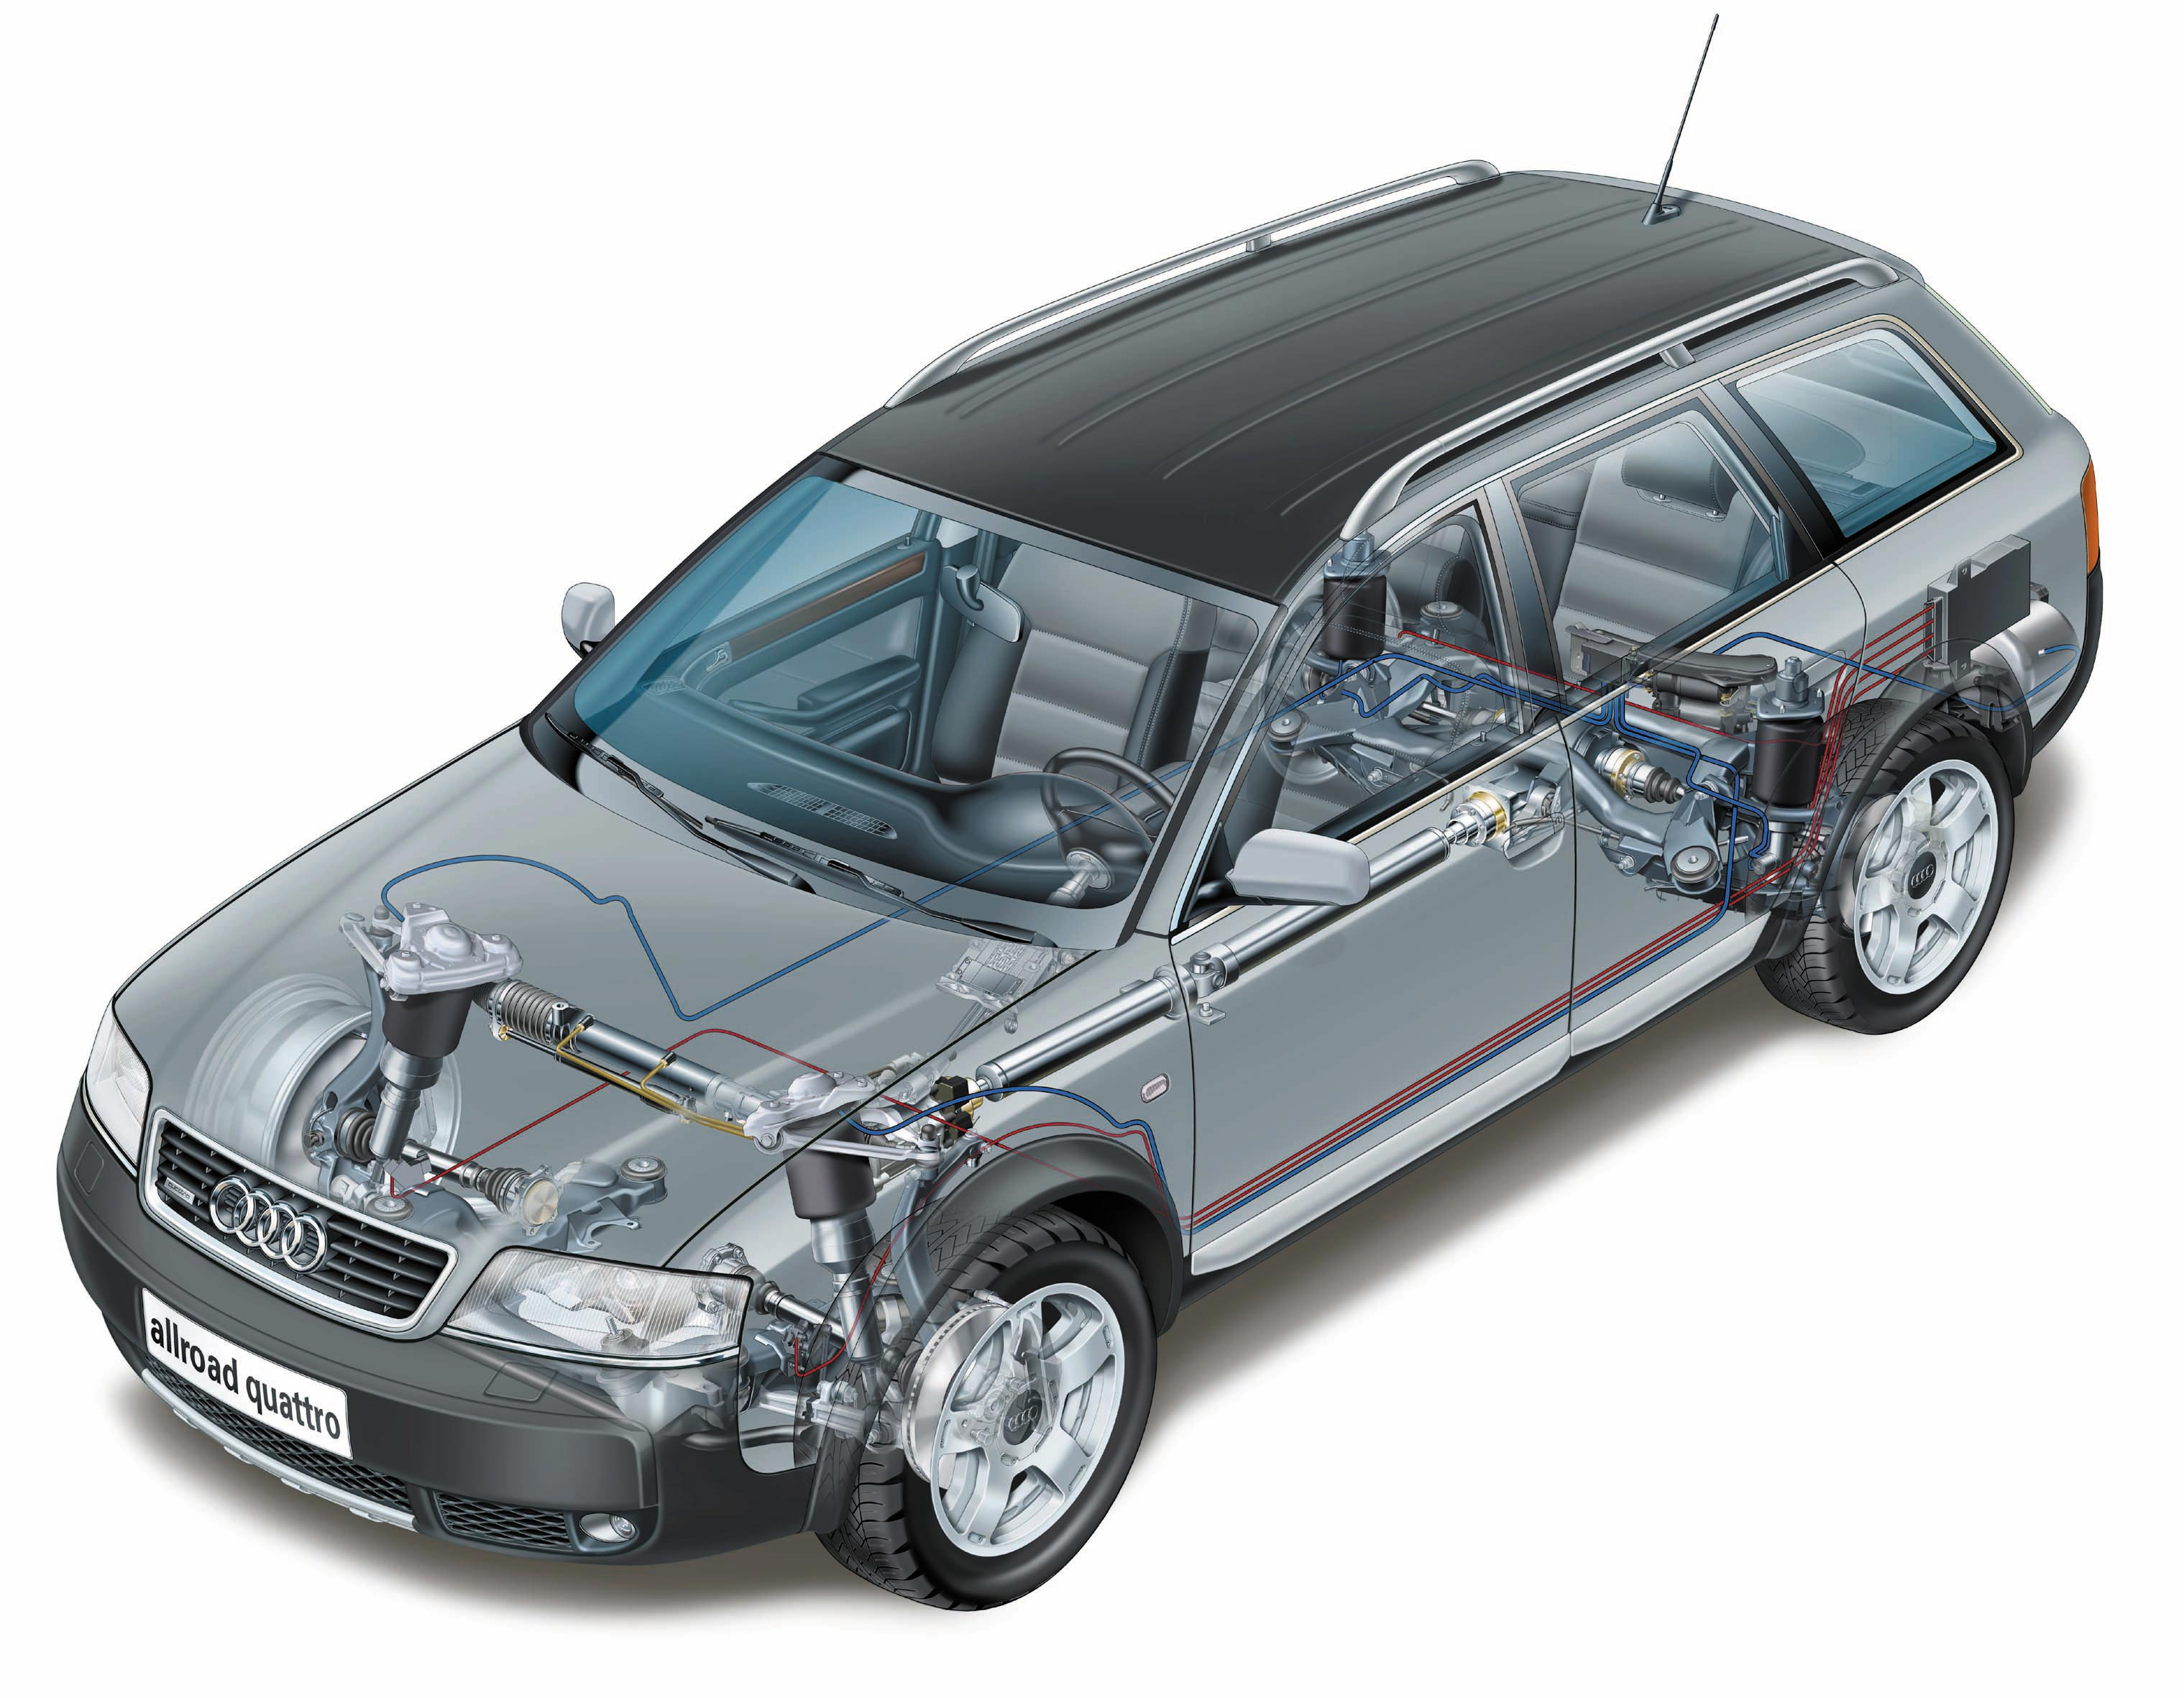 Audi Allroad Quattro cutaway drawing